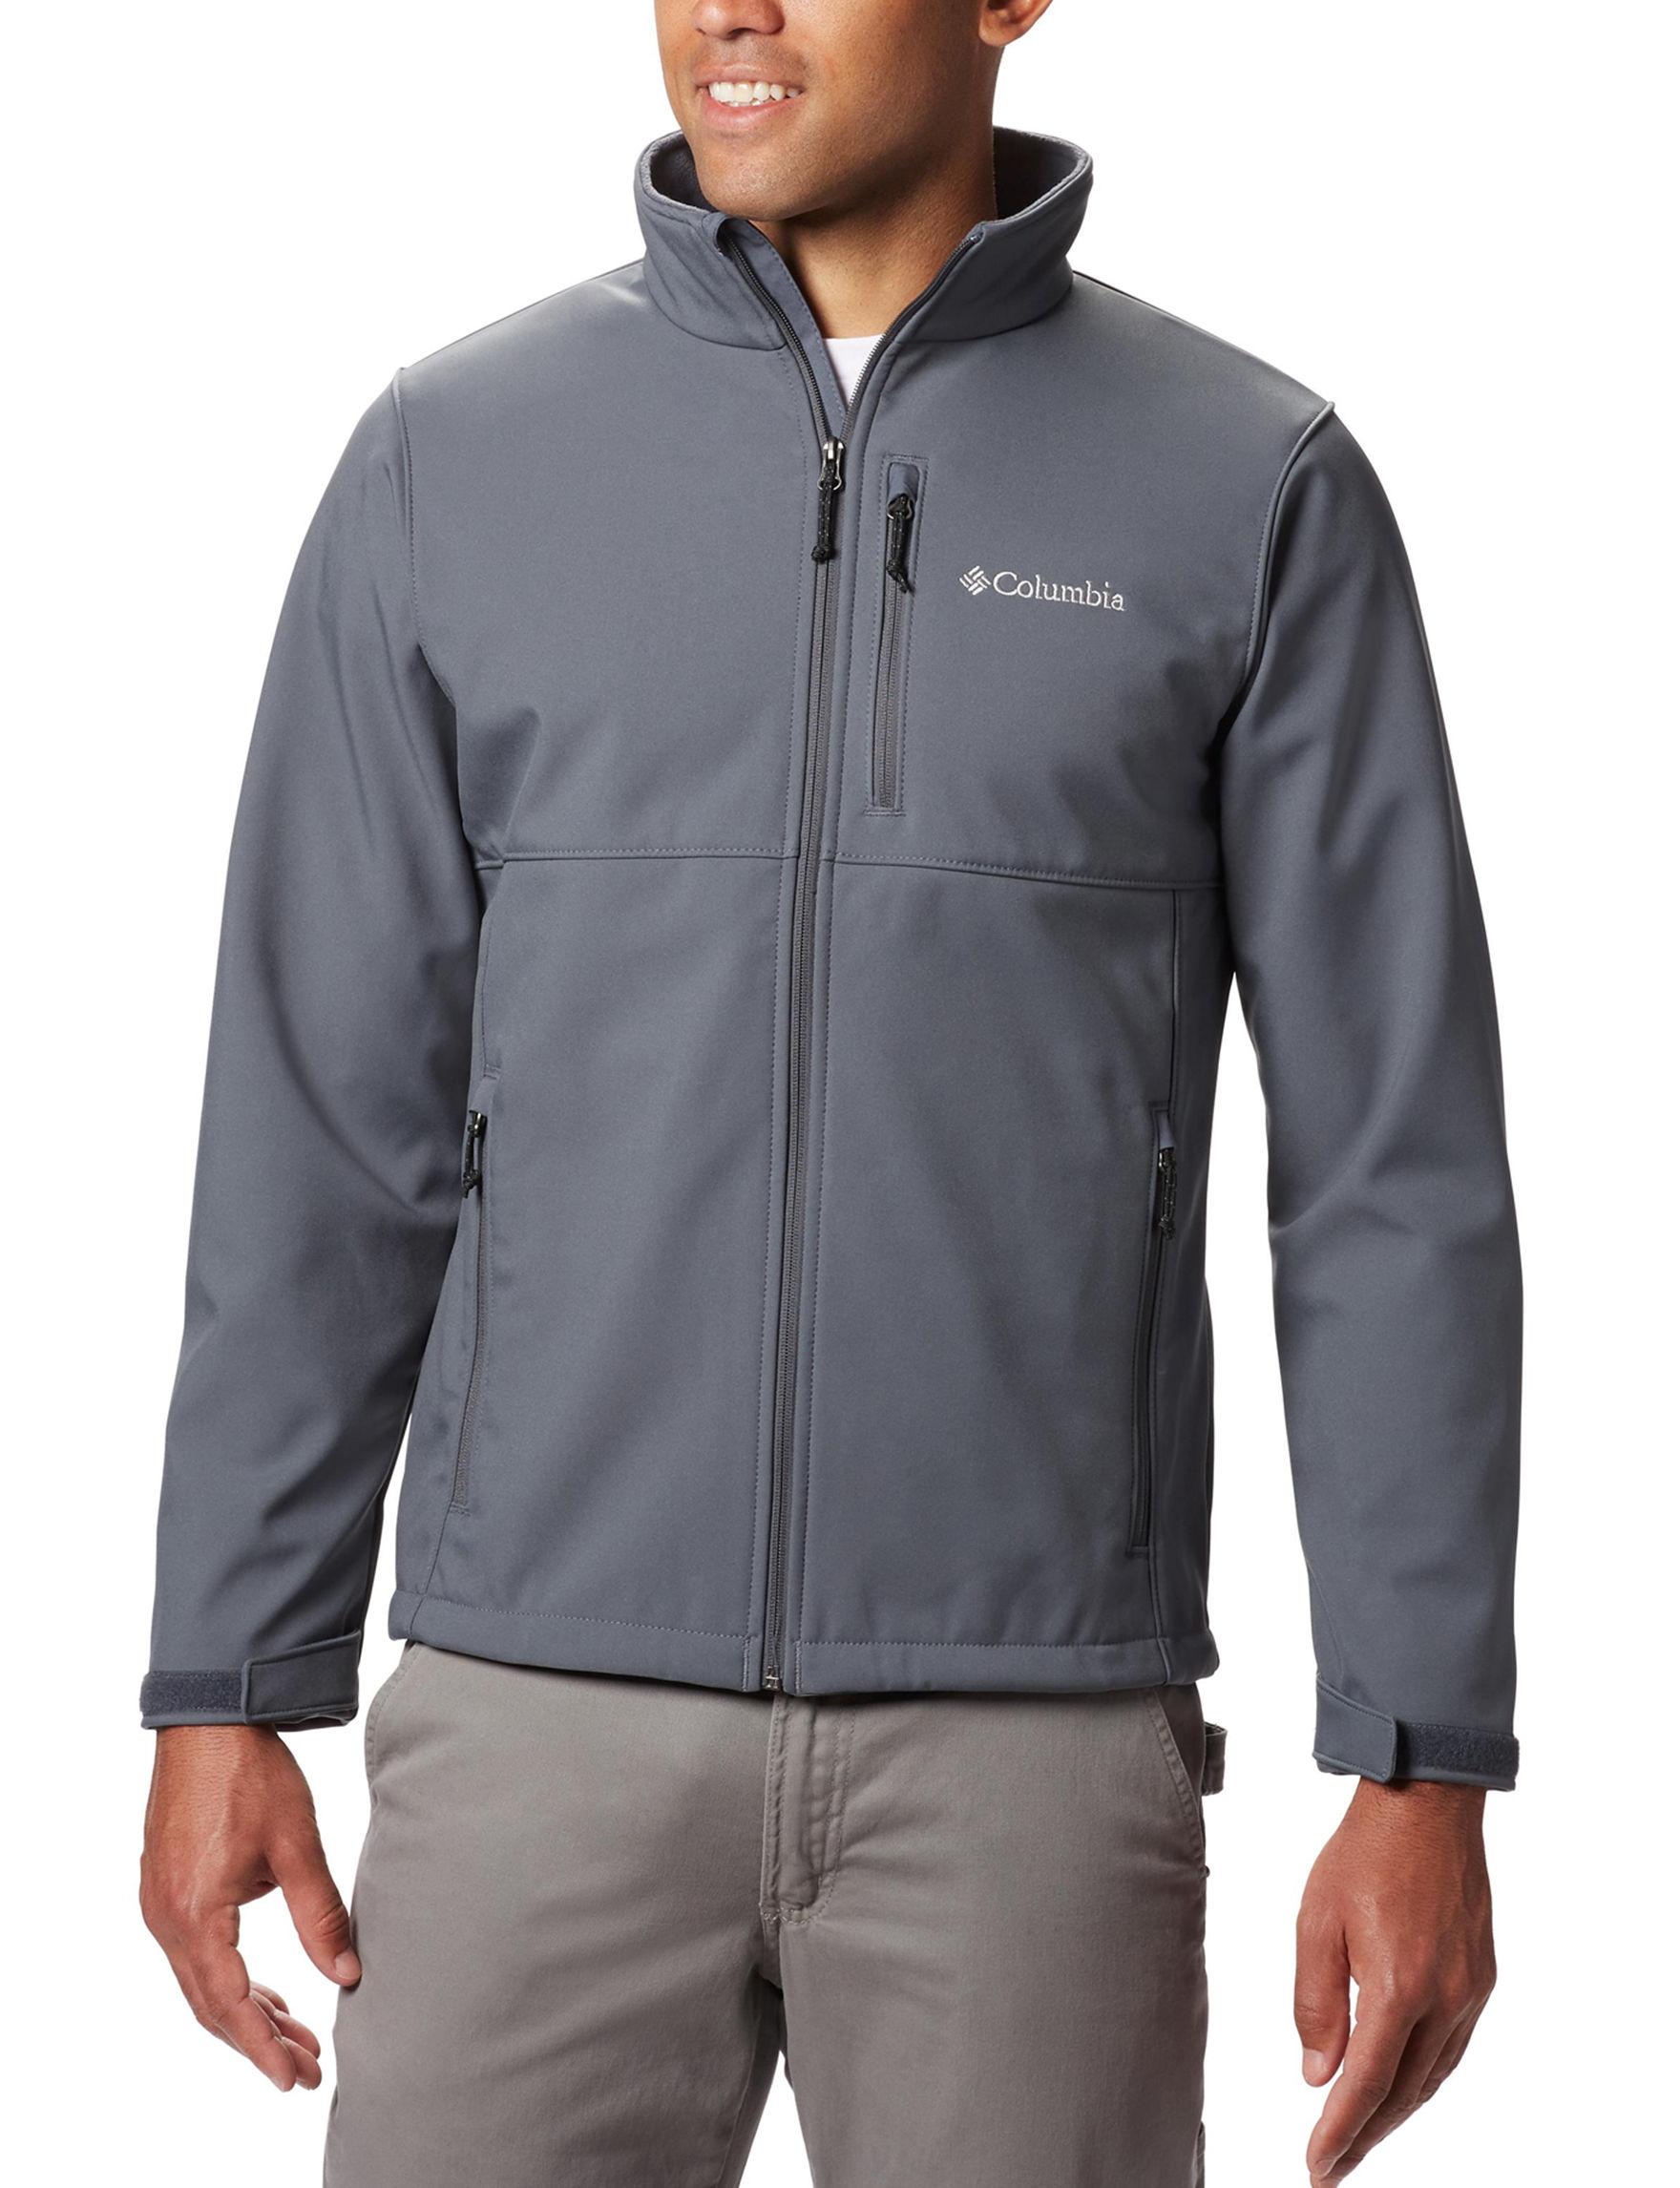 Columbia Charcoal Lightweight Jackets & Blazers